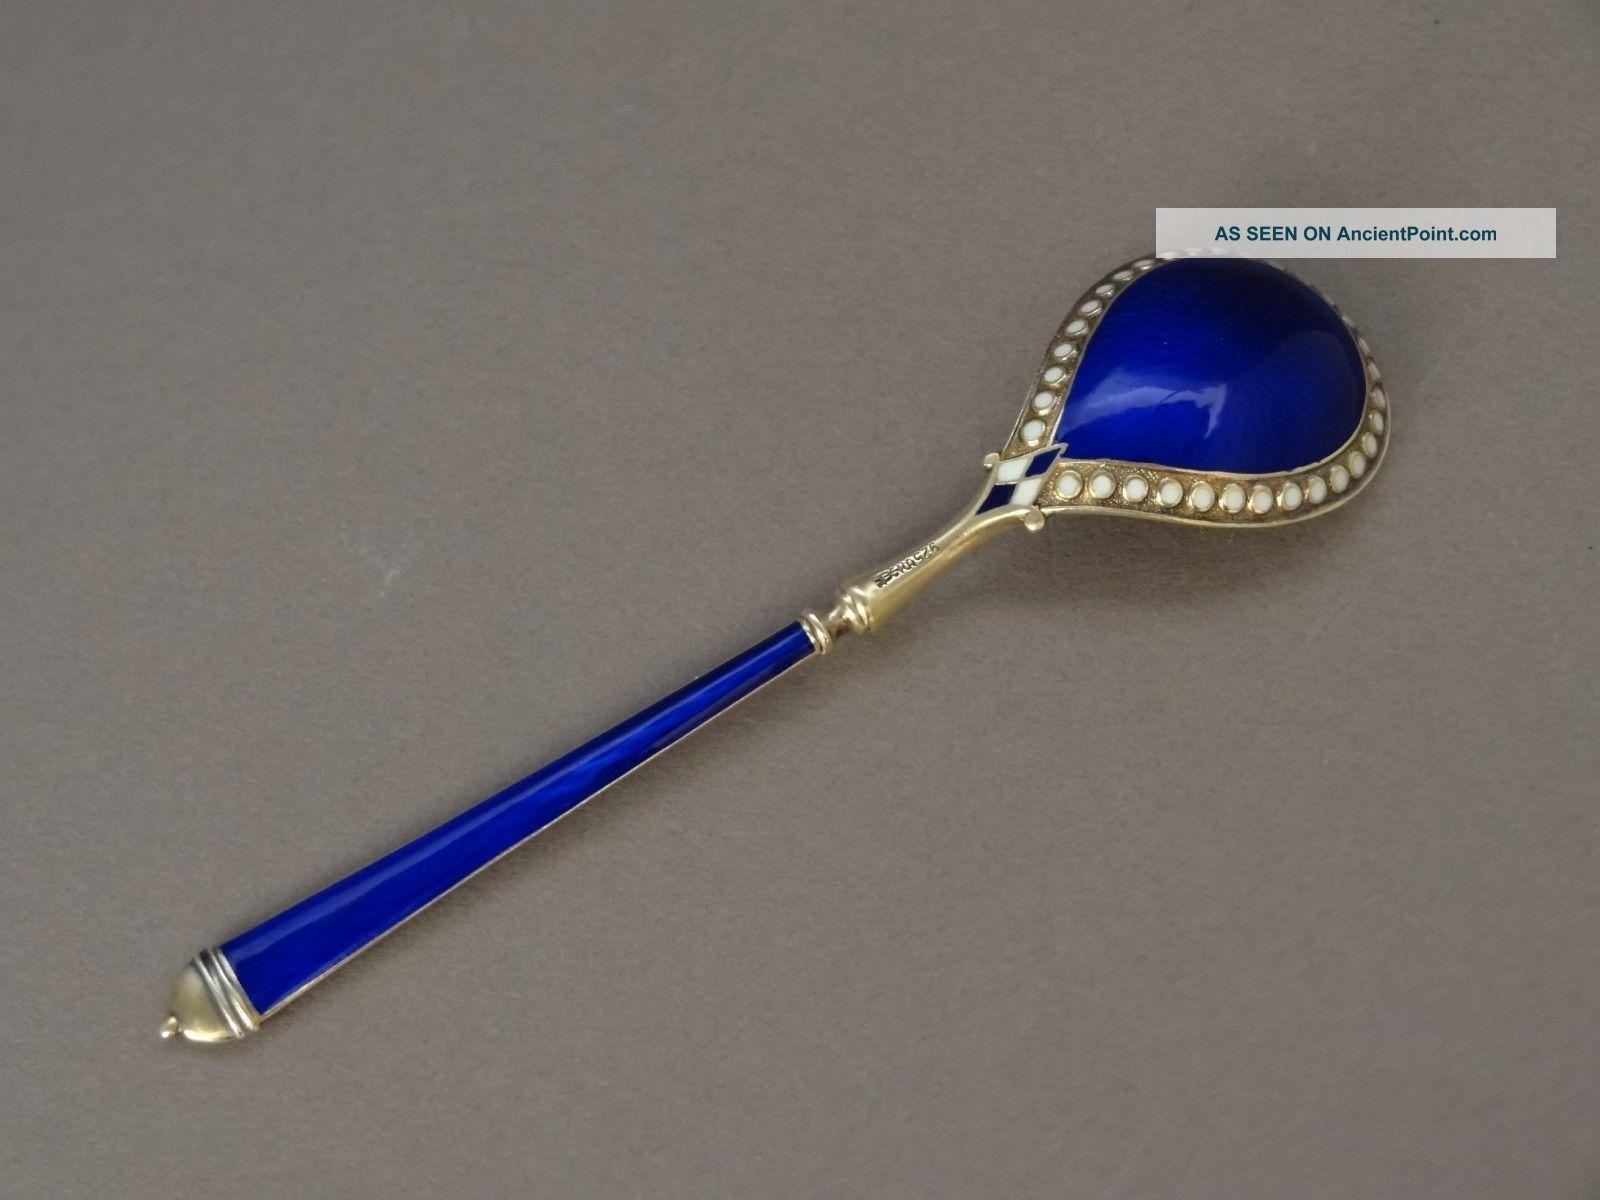 Antique David Andersen Norway Sterling Silver Cobalt Blue Enamel Spoon 1900 - 20 Scandinavia photo